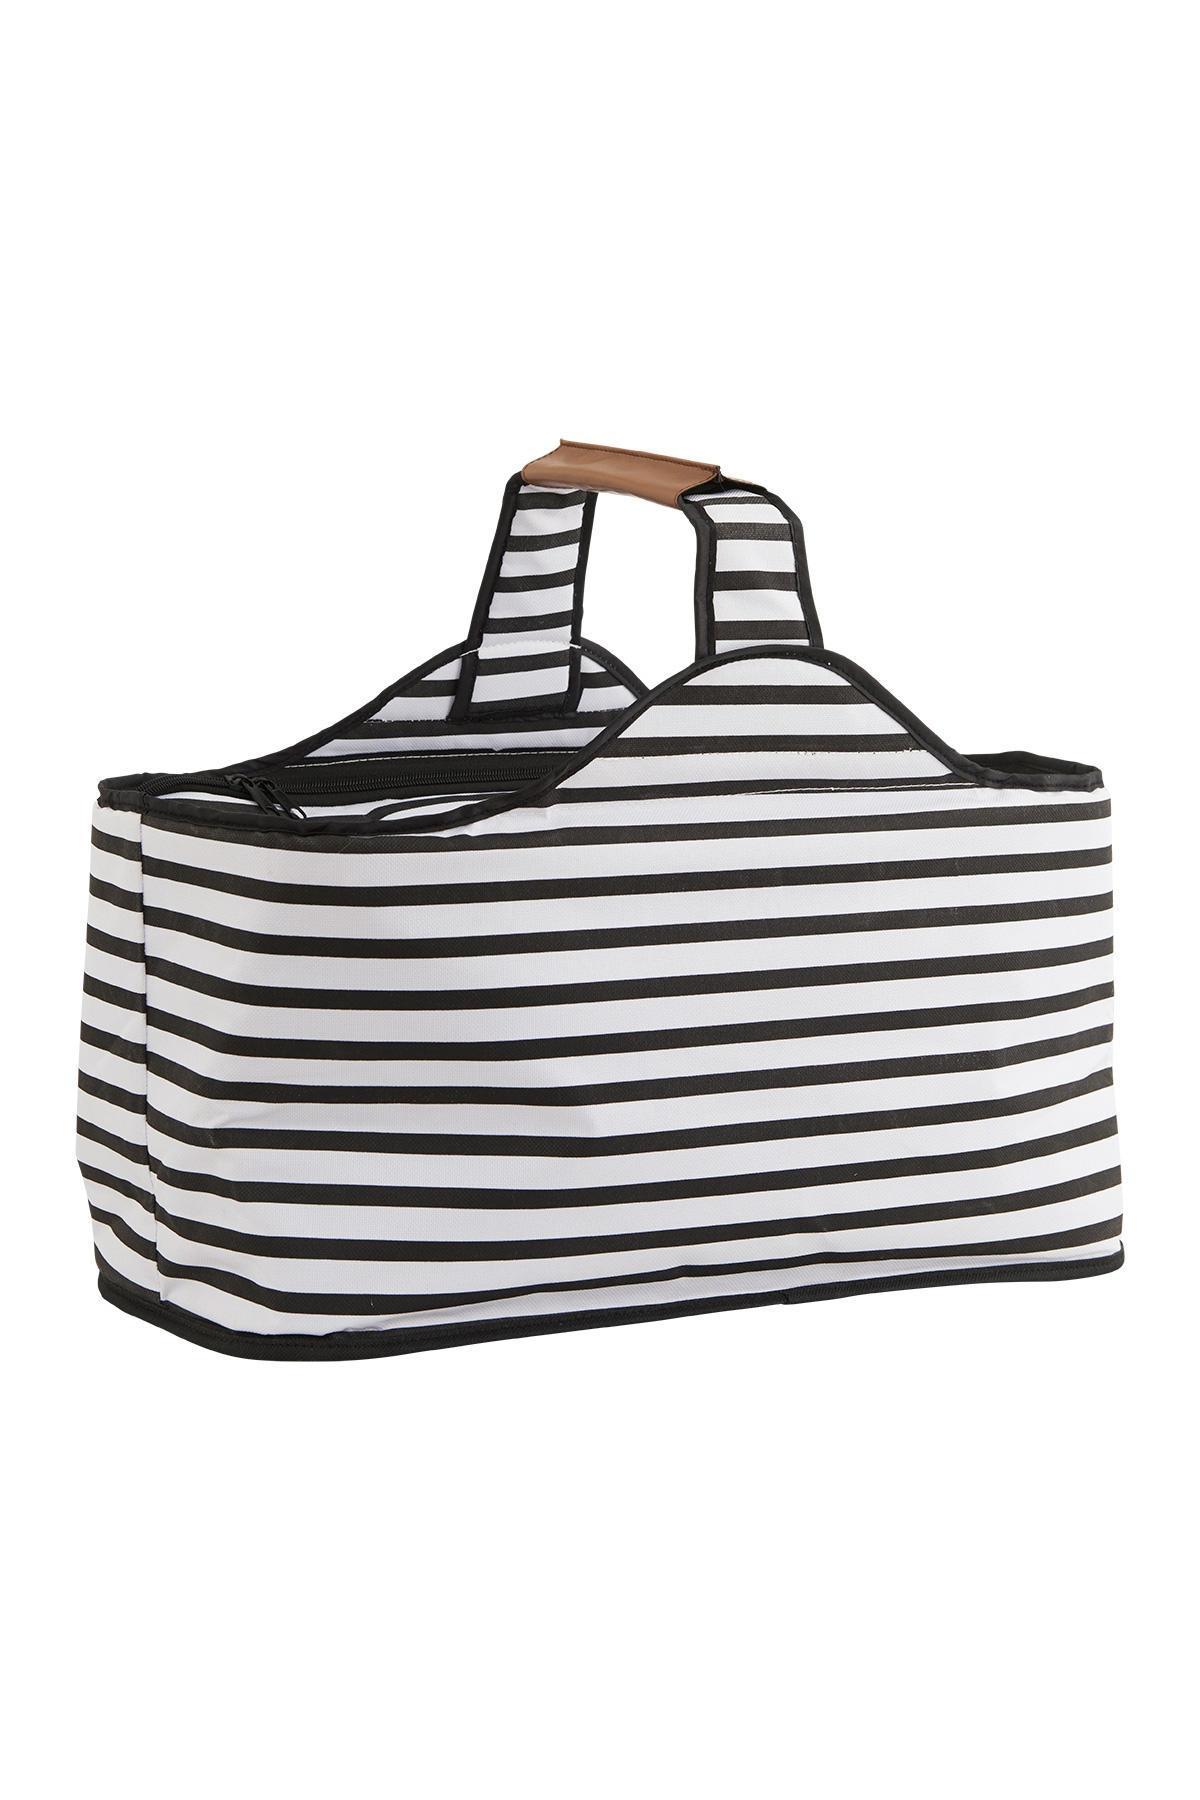 House Doctor Chladící taška Stripes, černá barva, bílá barva, textil